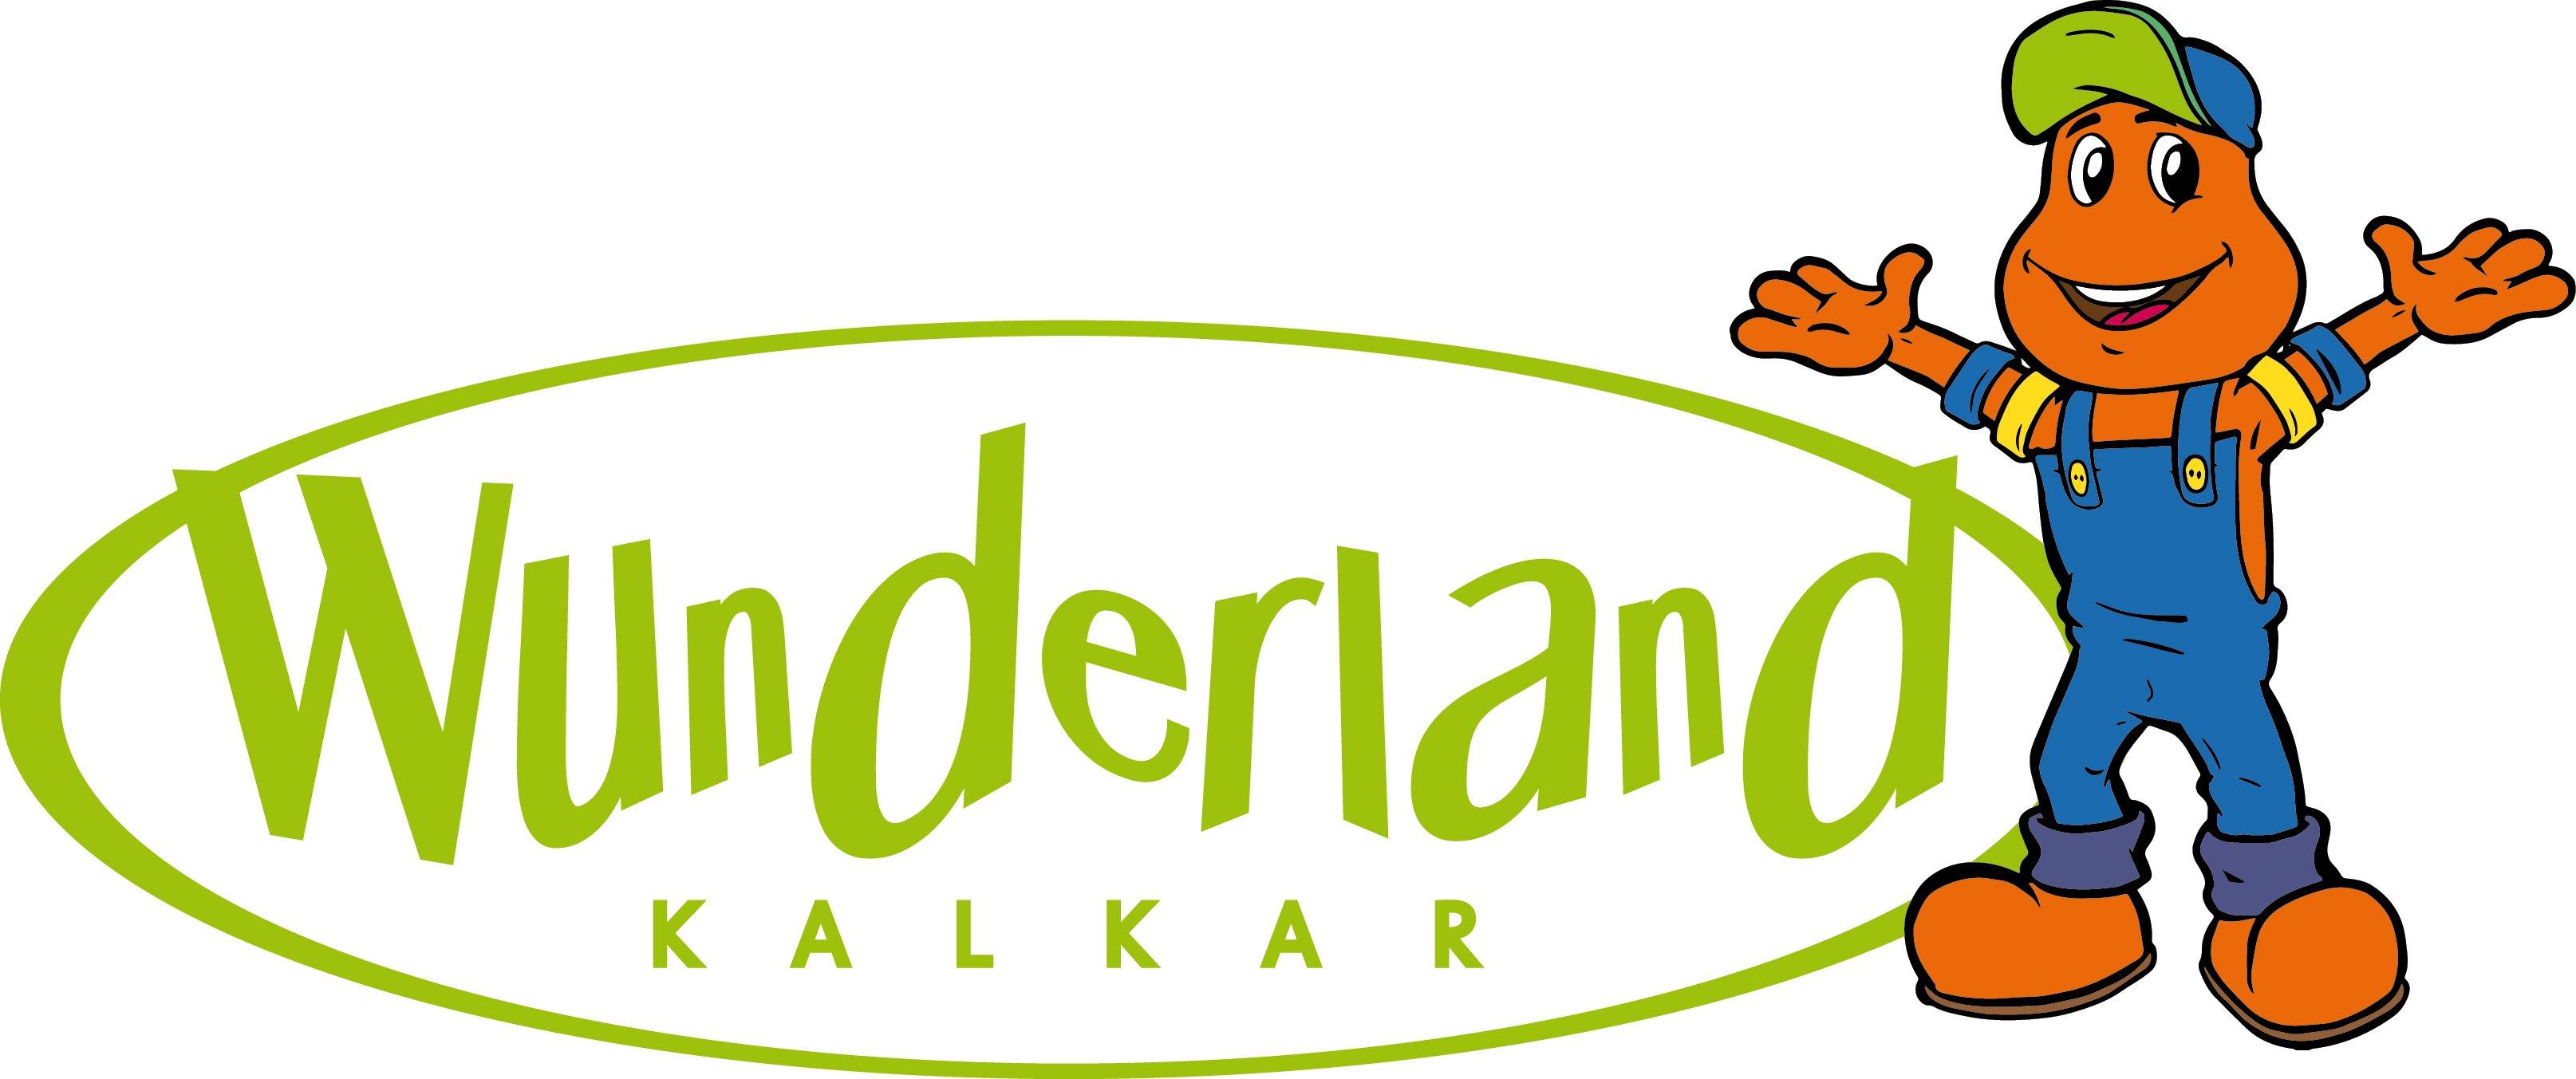 Logo-Kernie´s-Familienpark-im-Wunderland